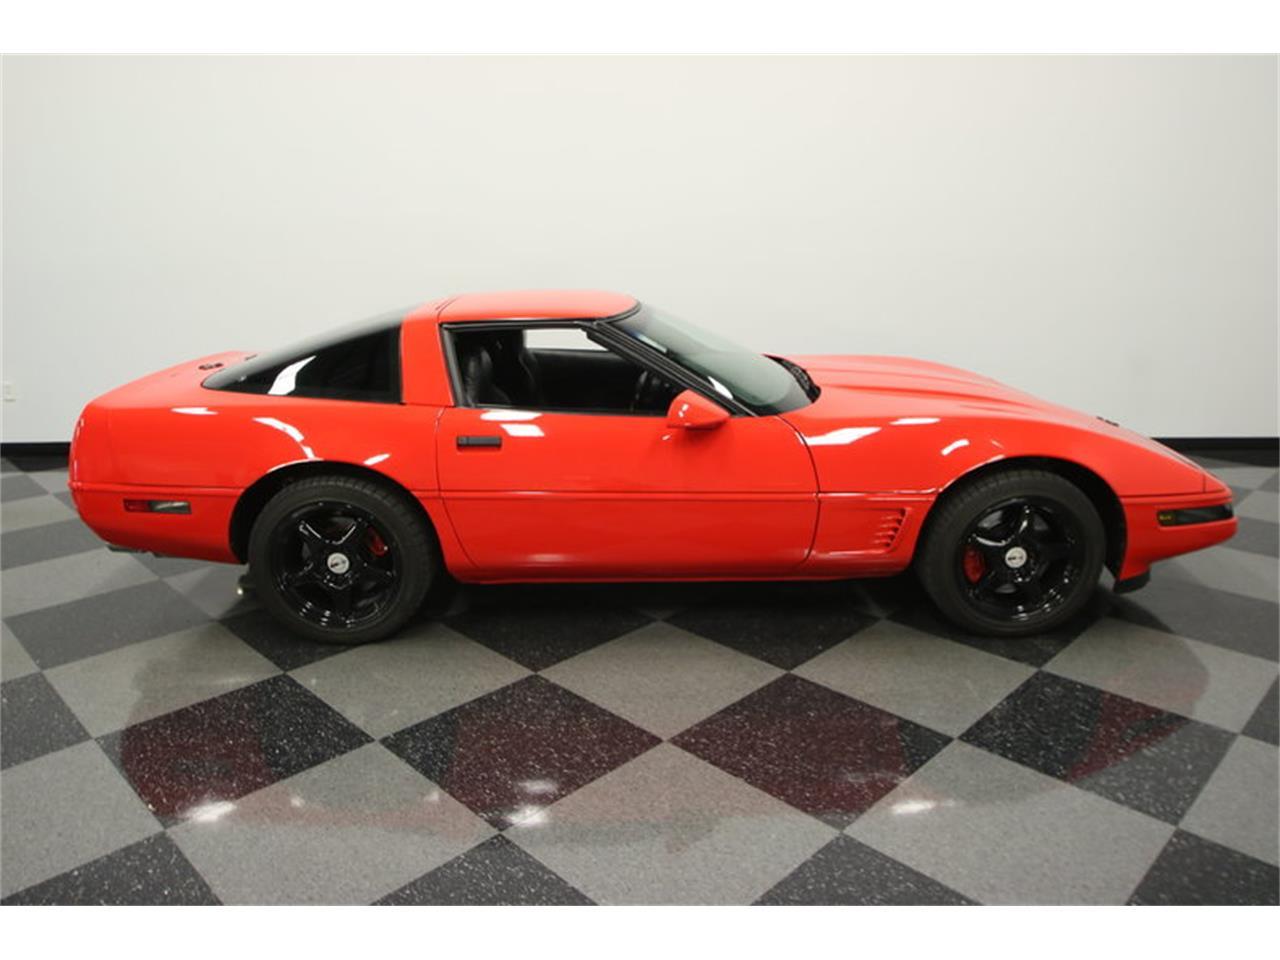 Large Picture of '95 Corvette located in Lutz Florida - $15,995.00 - IURO